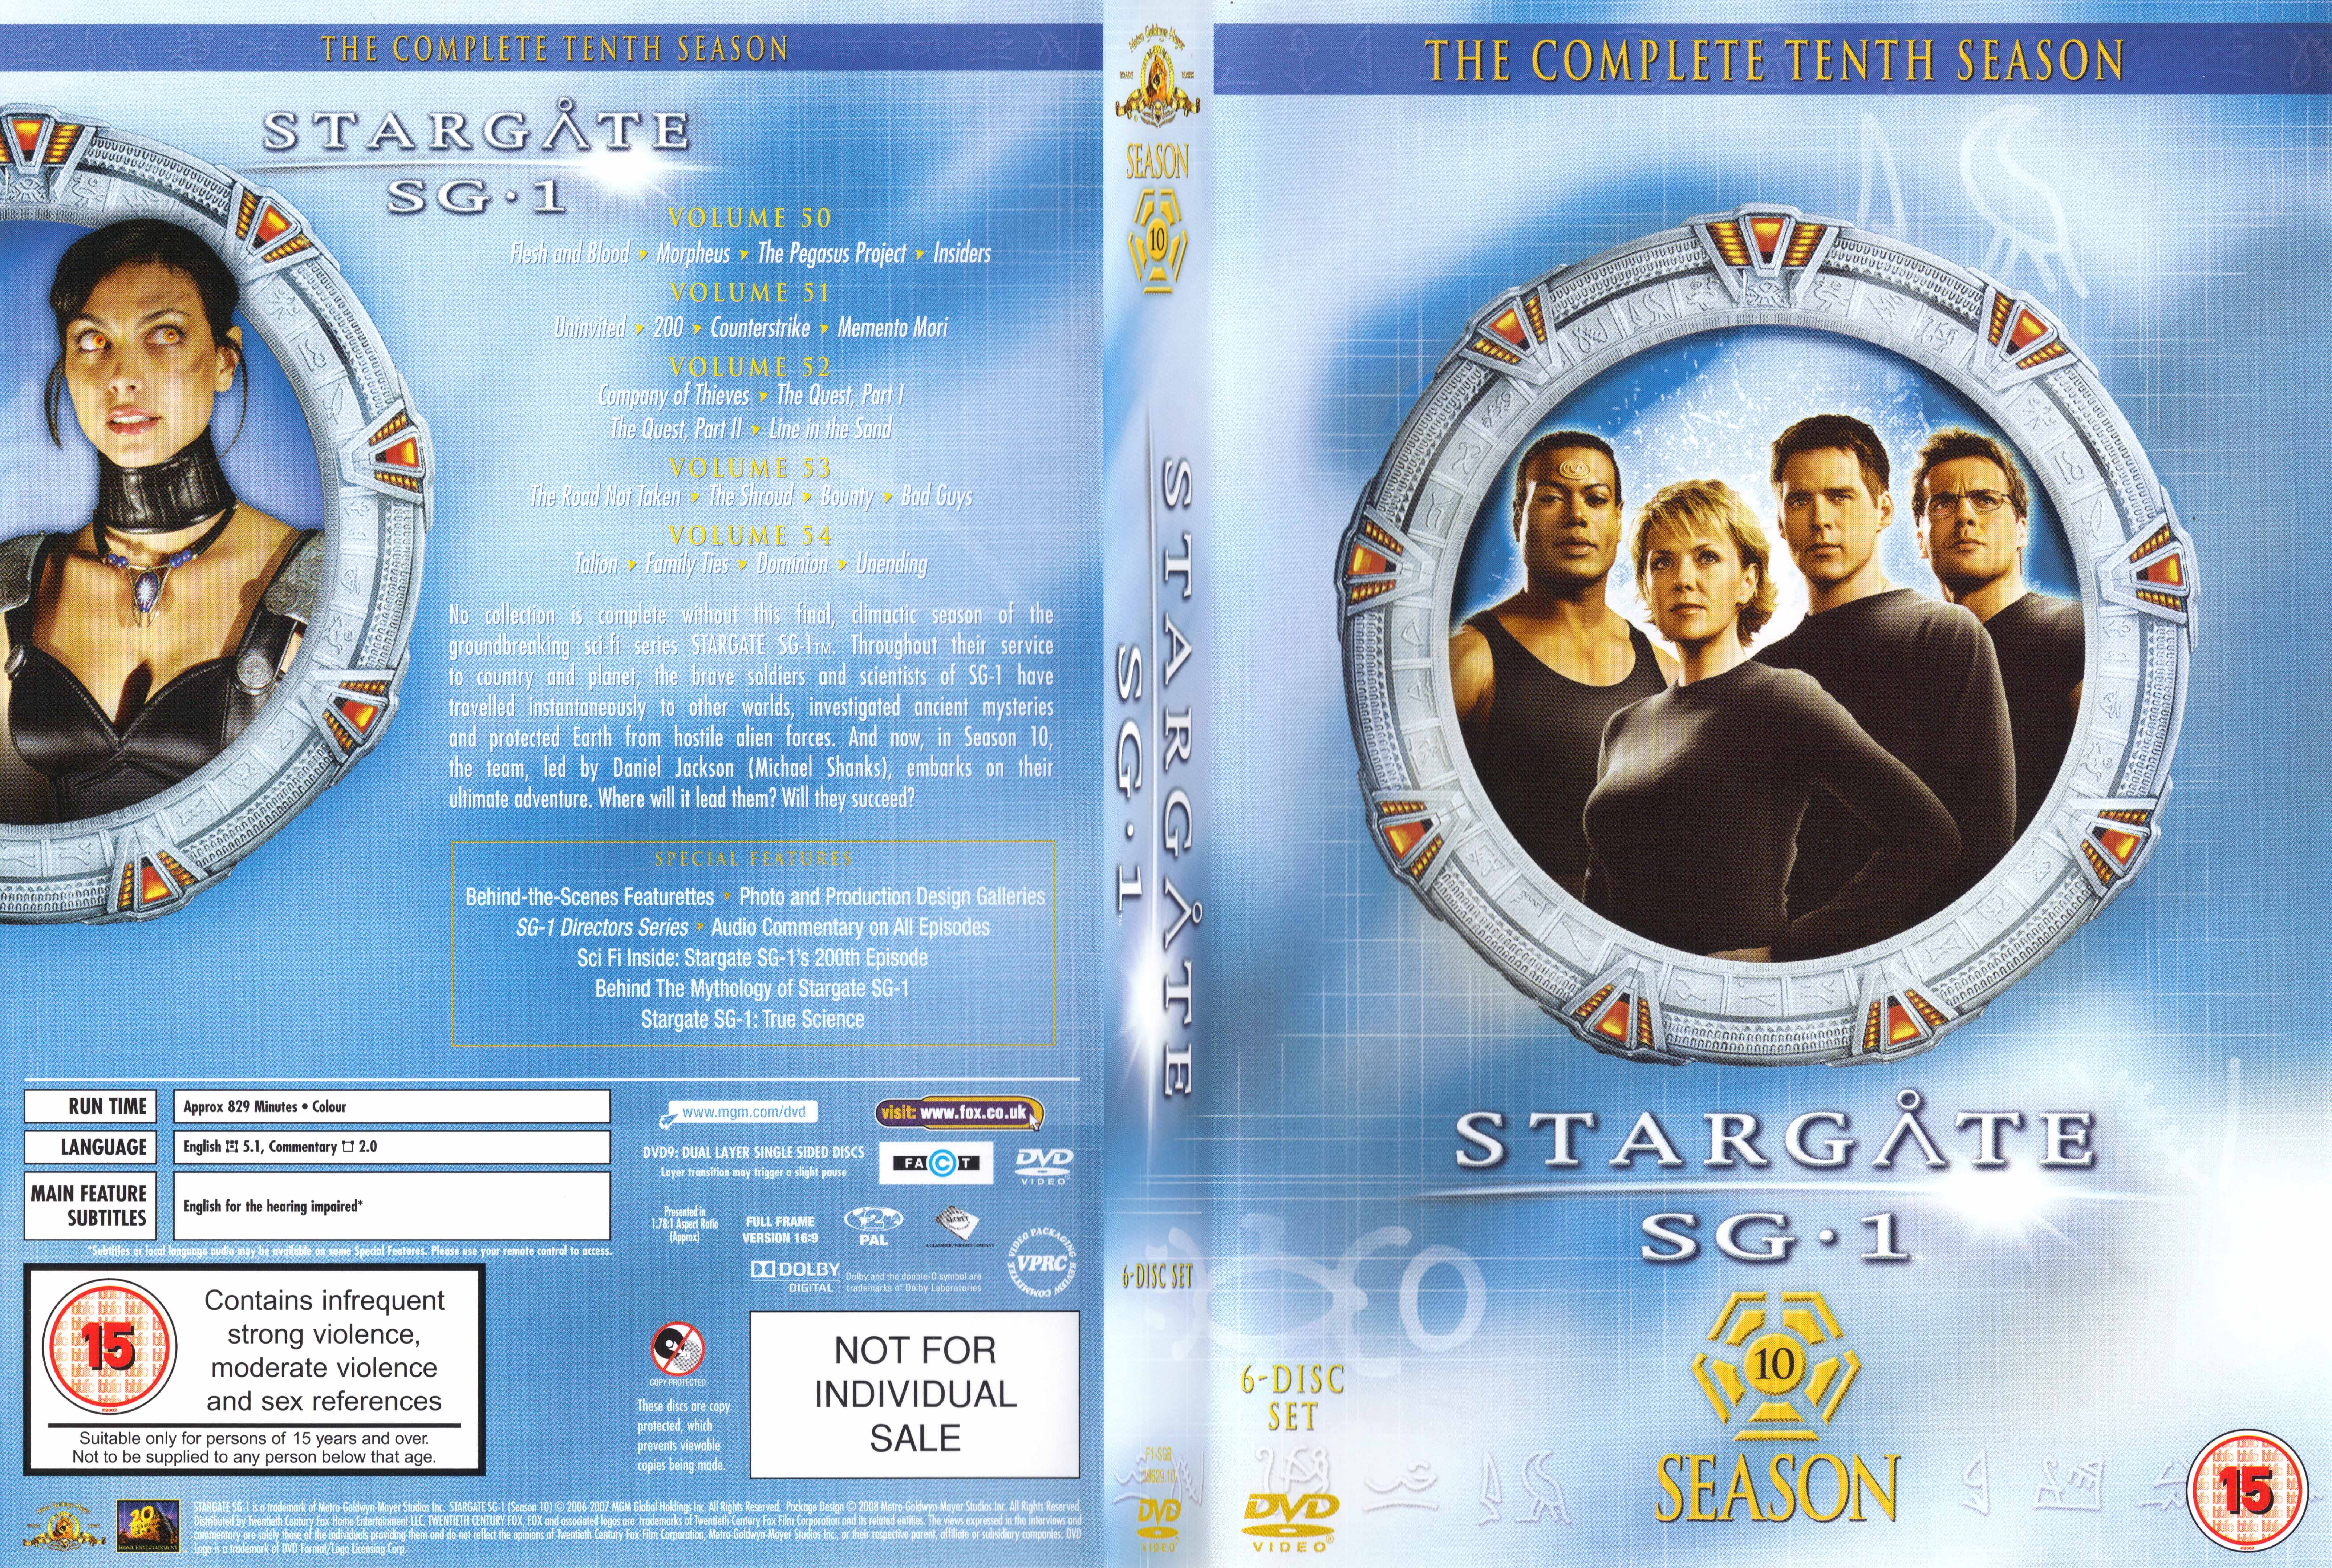 Stargate sg-1 season 3 episode guide & summaries and tv show schedule.